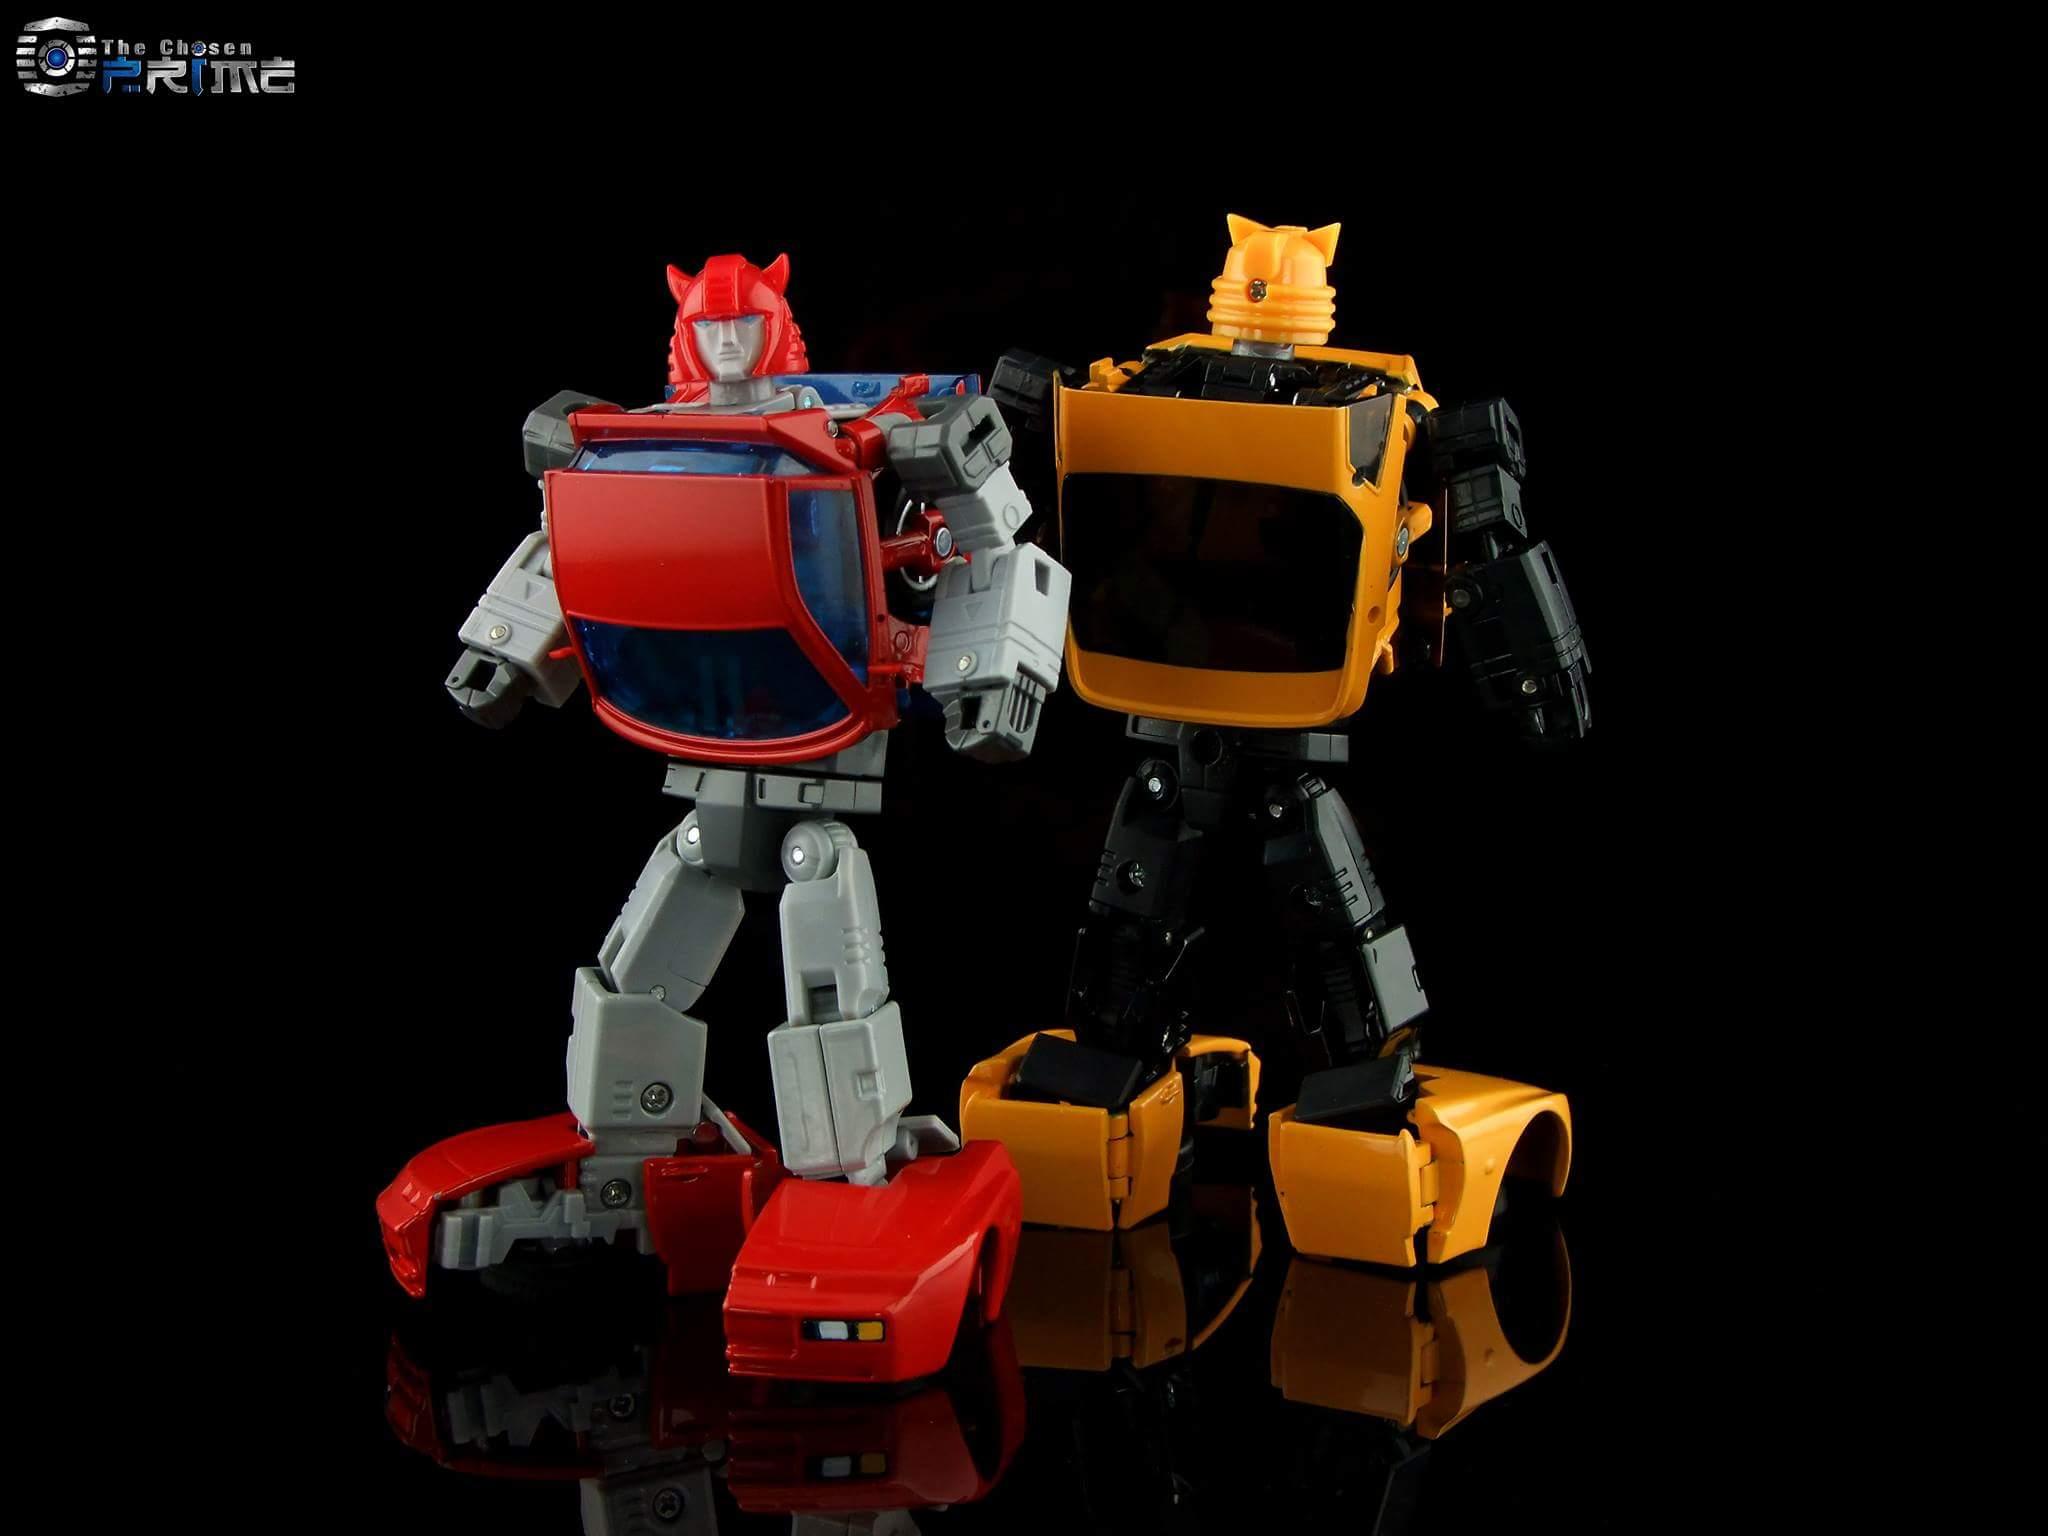 [ACE Collectables] Produit Tiers - Minibots MP - ACE-01 Tumbler (aka Cliffjumper/Matamore), ACE-02 Hiccups (aka Hubcap/Virevolto), ACE-03 Trident (aka Seaspray/Embruns) UxffGO5m